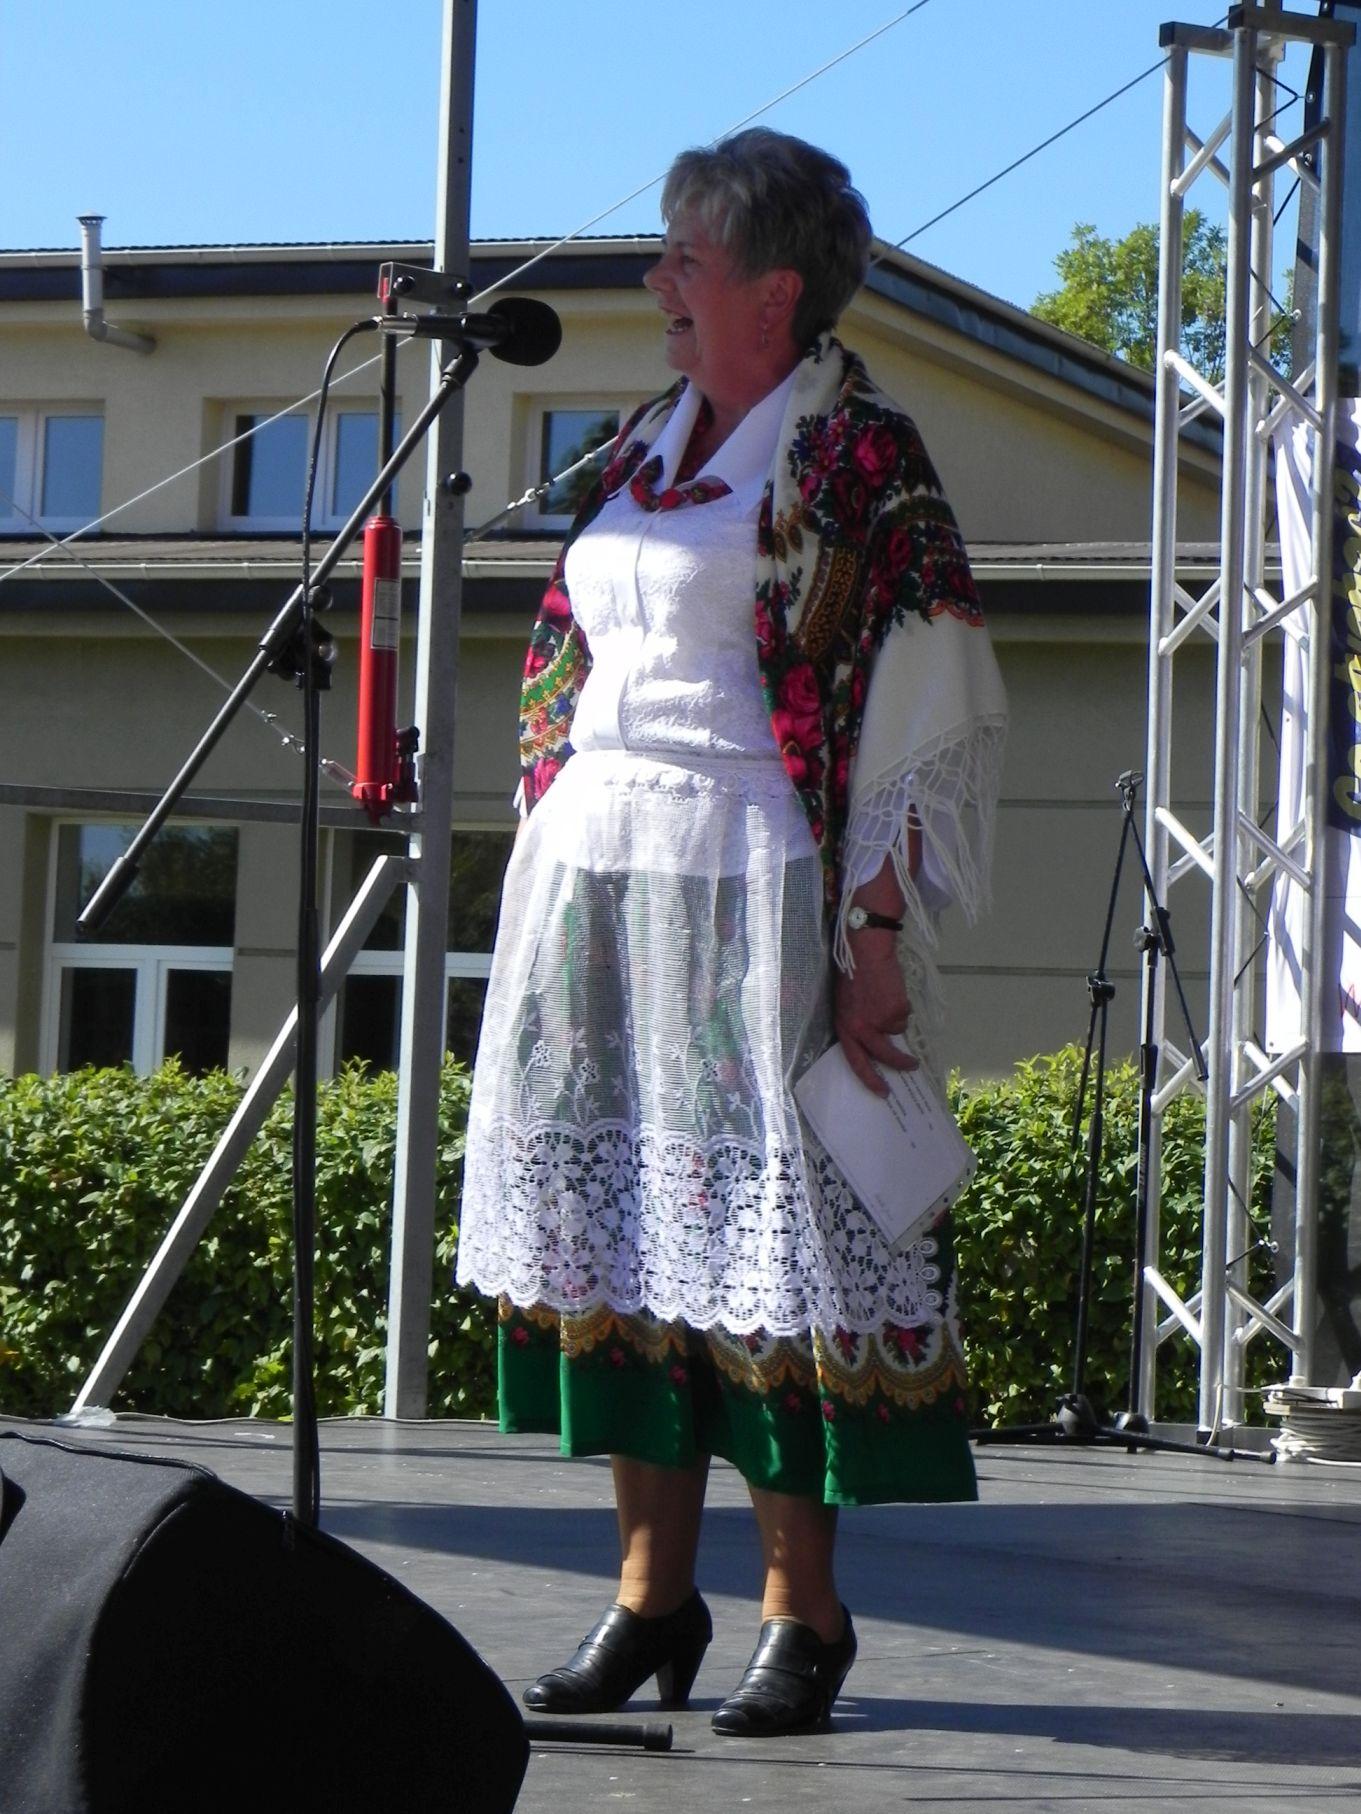 2013-09-10 Festyn - Mińsk Maz (30)